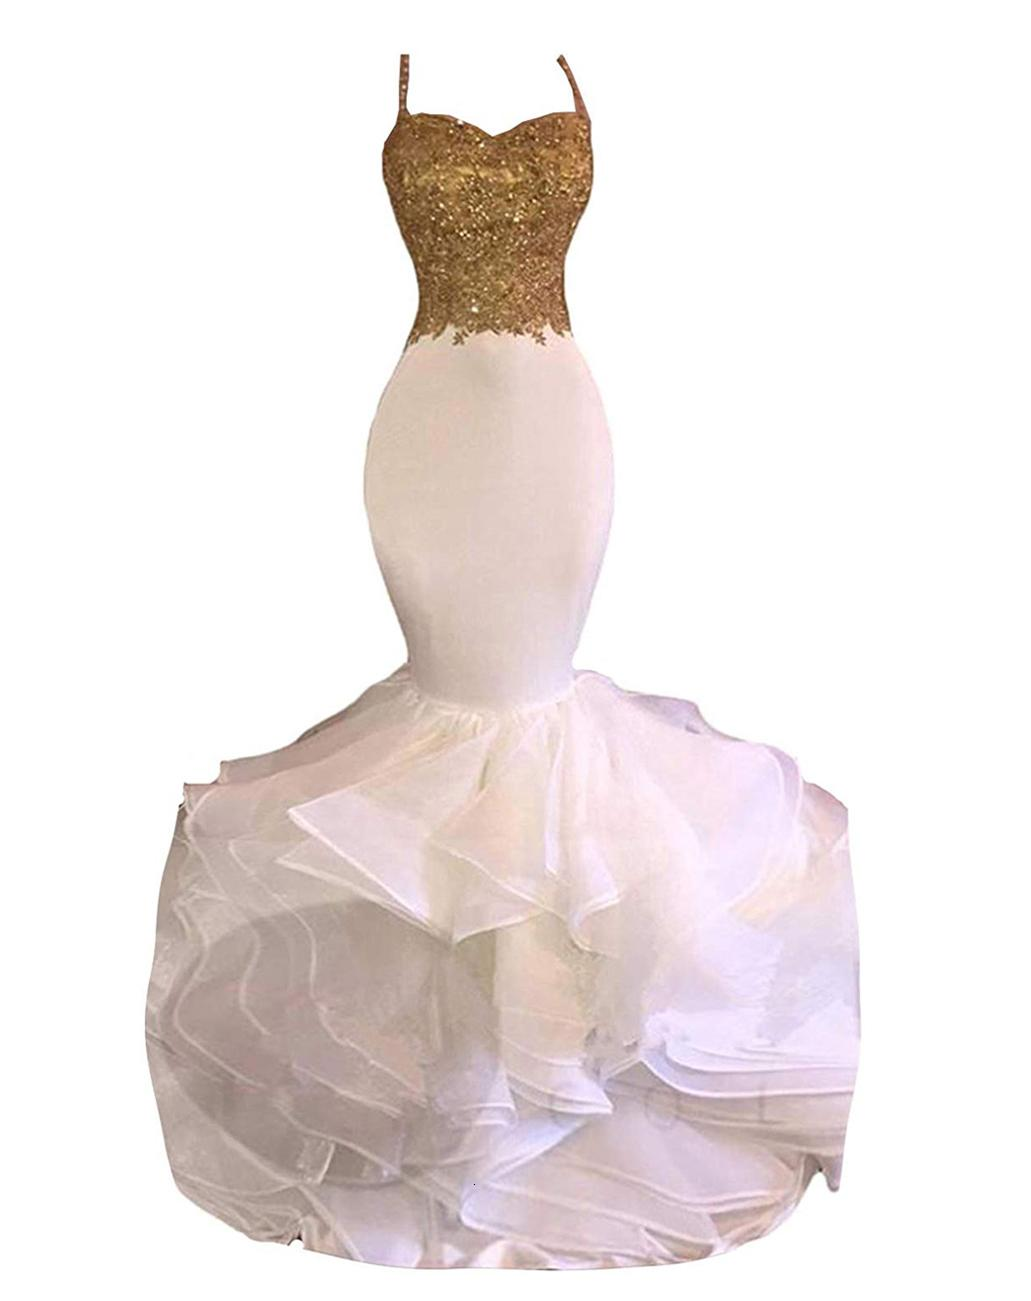 2021 New Sexy Breabless Squide Mermaid Córfed Homecoming astreteart ... Ремни без спины ... Платье для вечеринок ... молния в SV79